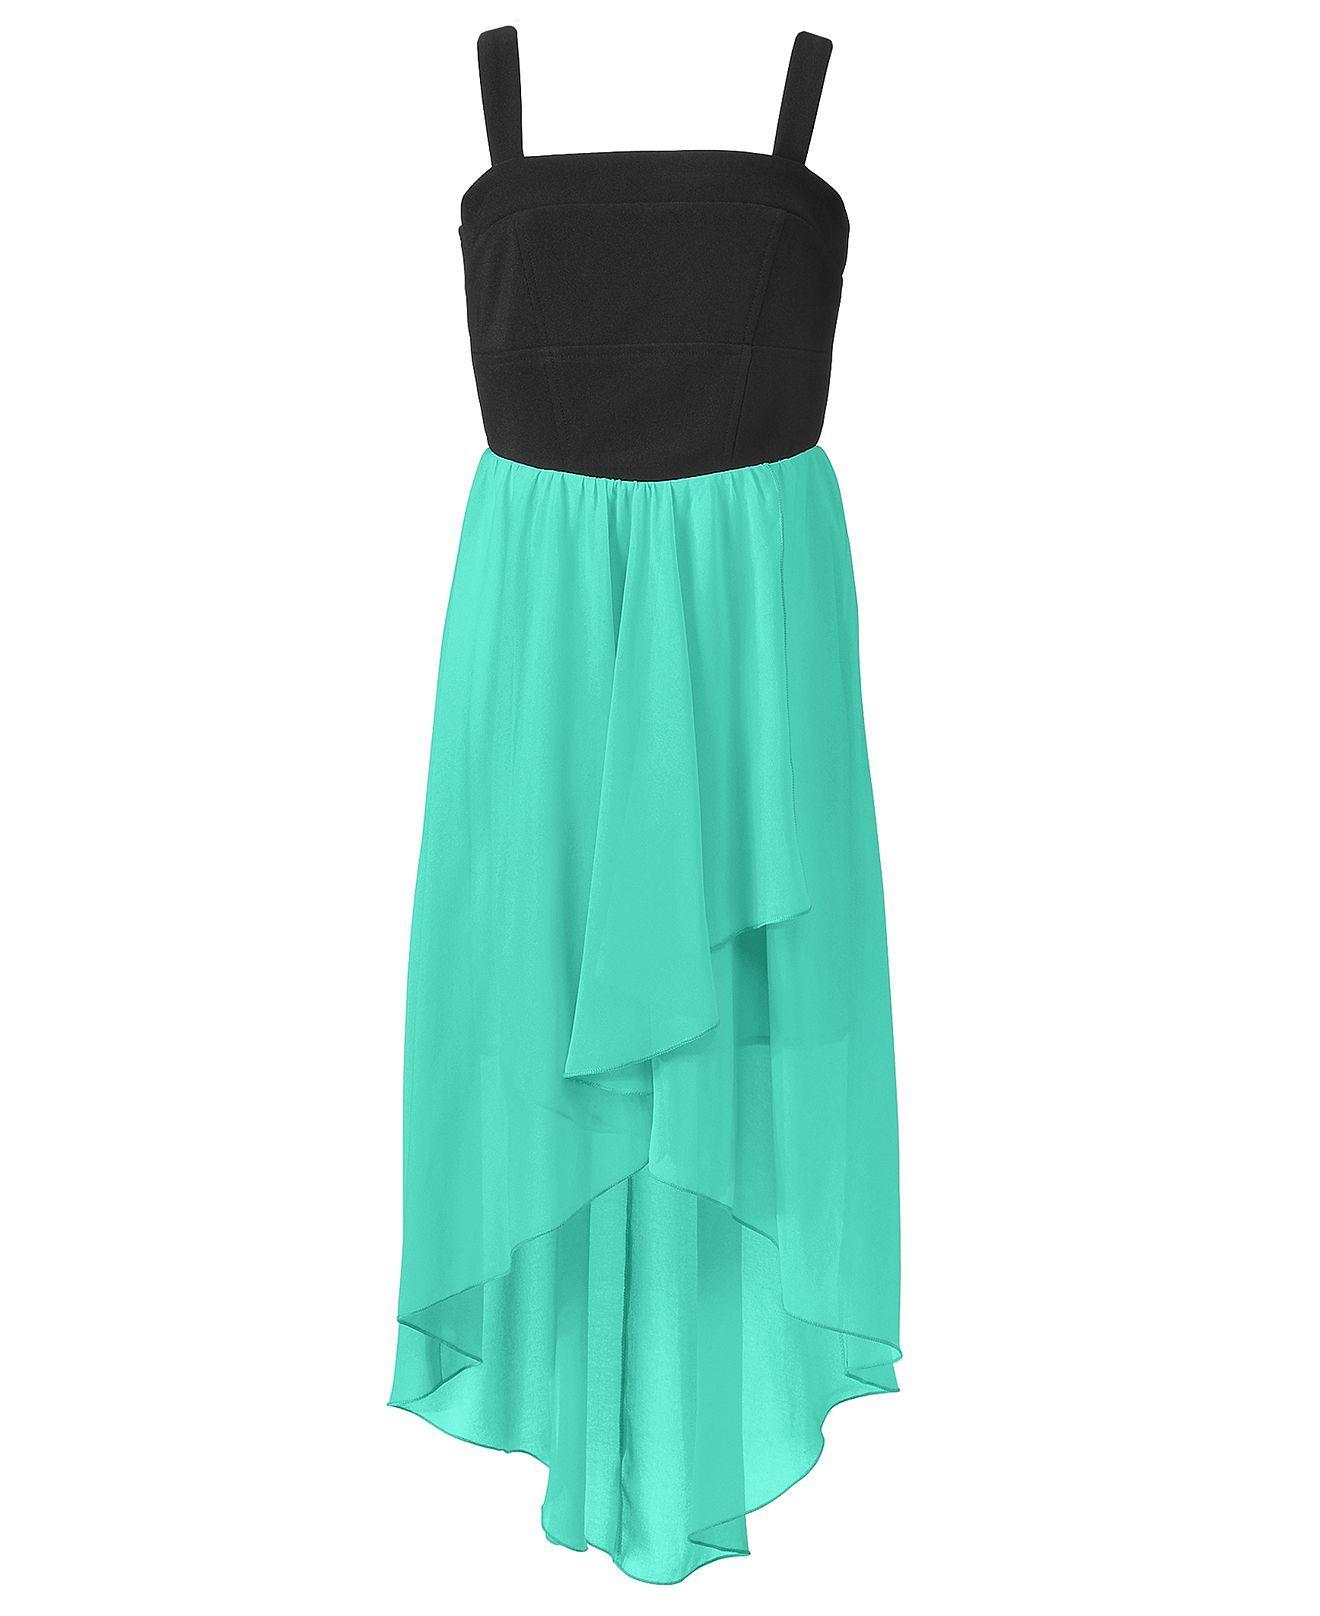 Ruby Rox Girls Dress, Girls Chiffon High-Low Dress - Kids - Macy\'s ...